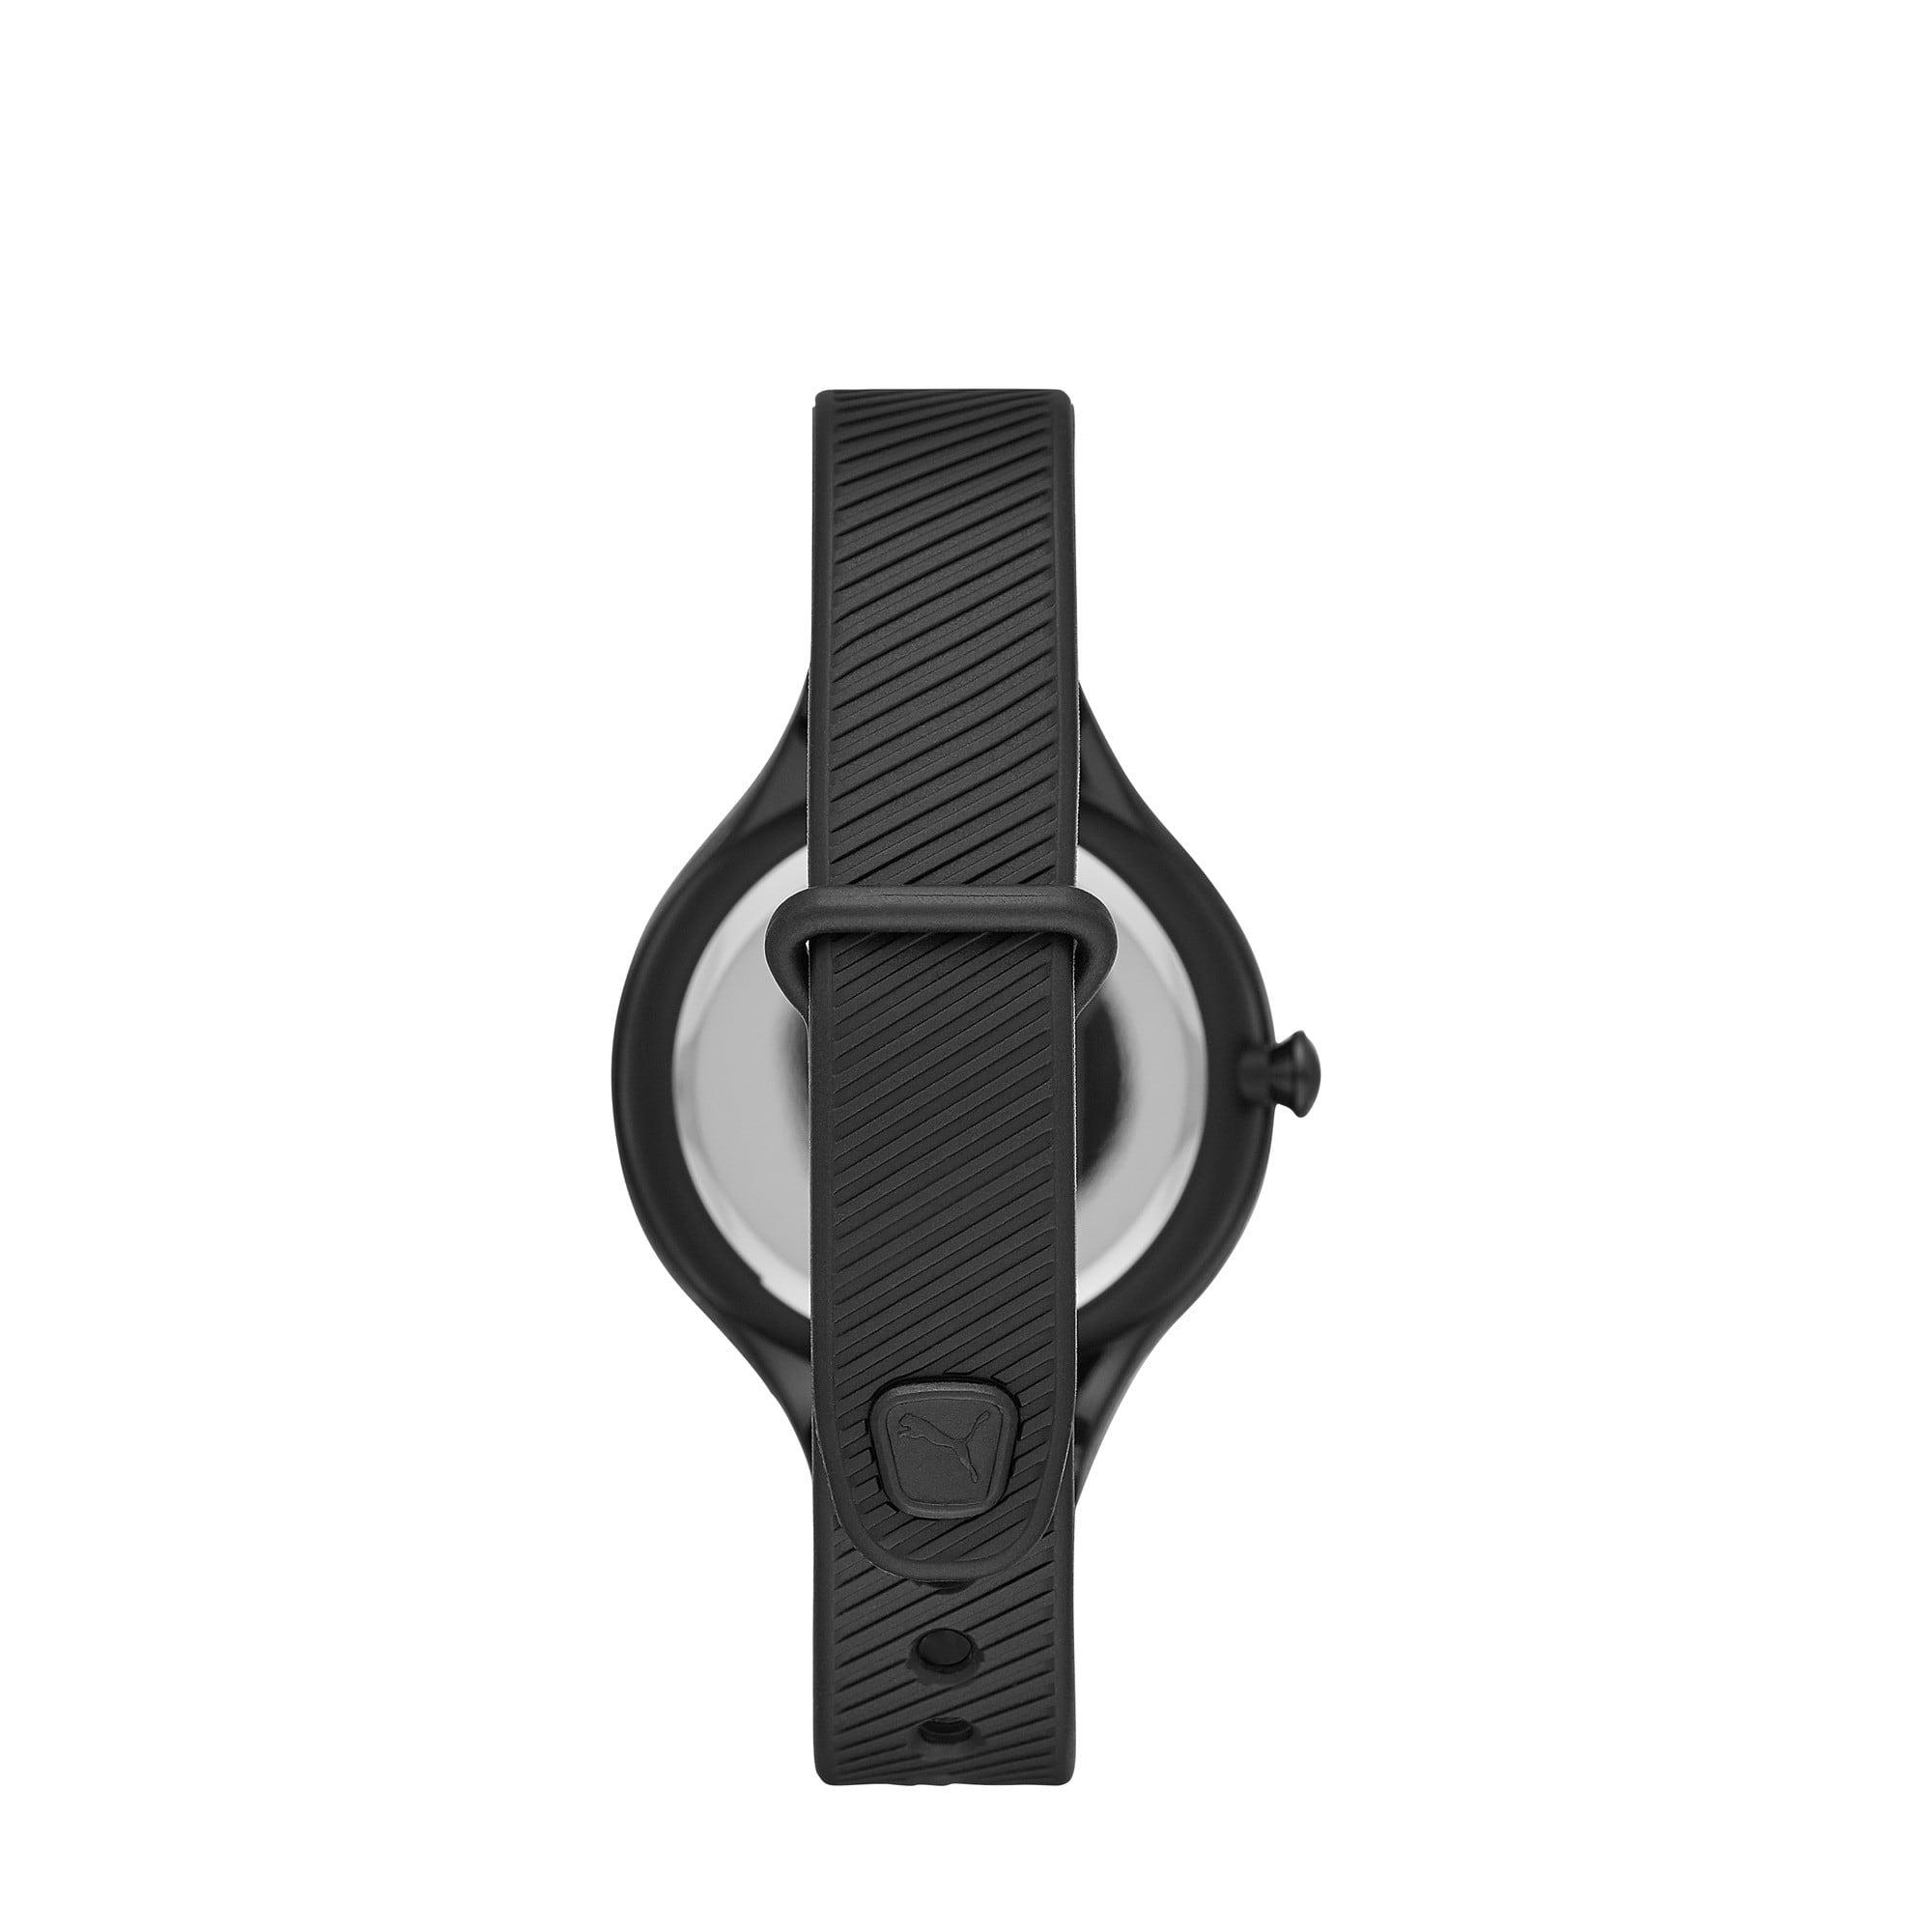 Thumbnail 2 of CONTOUR Ultra Slim Women's Watch, Black/Black, medium